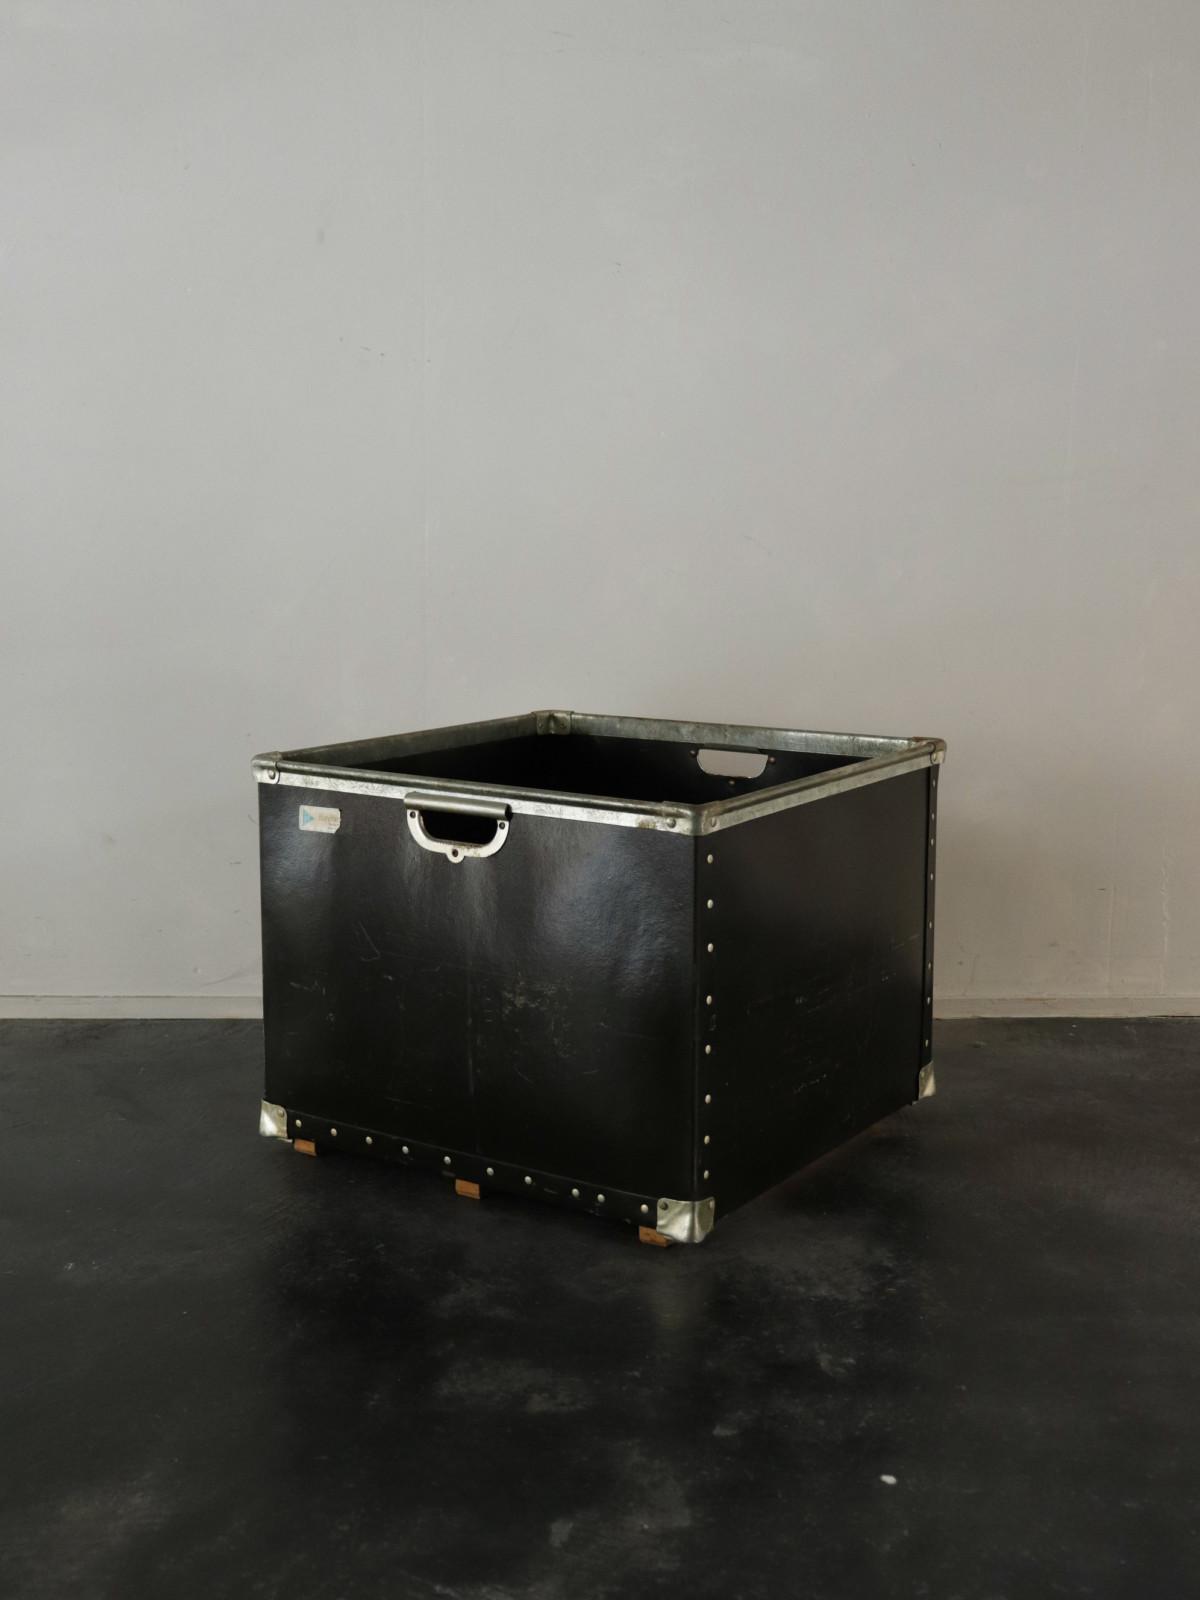 fiber box,USA,black box